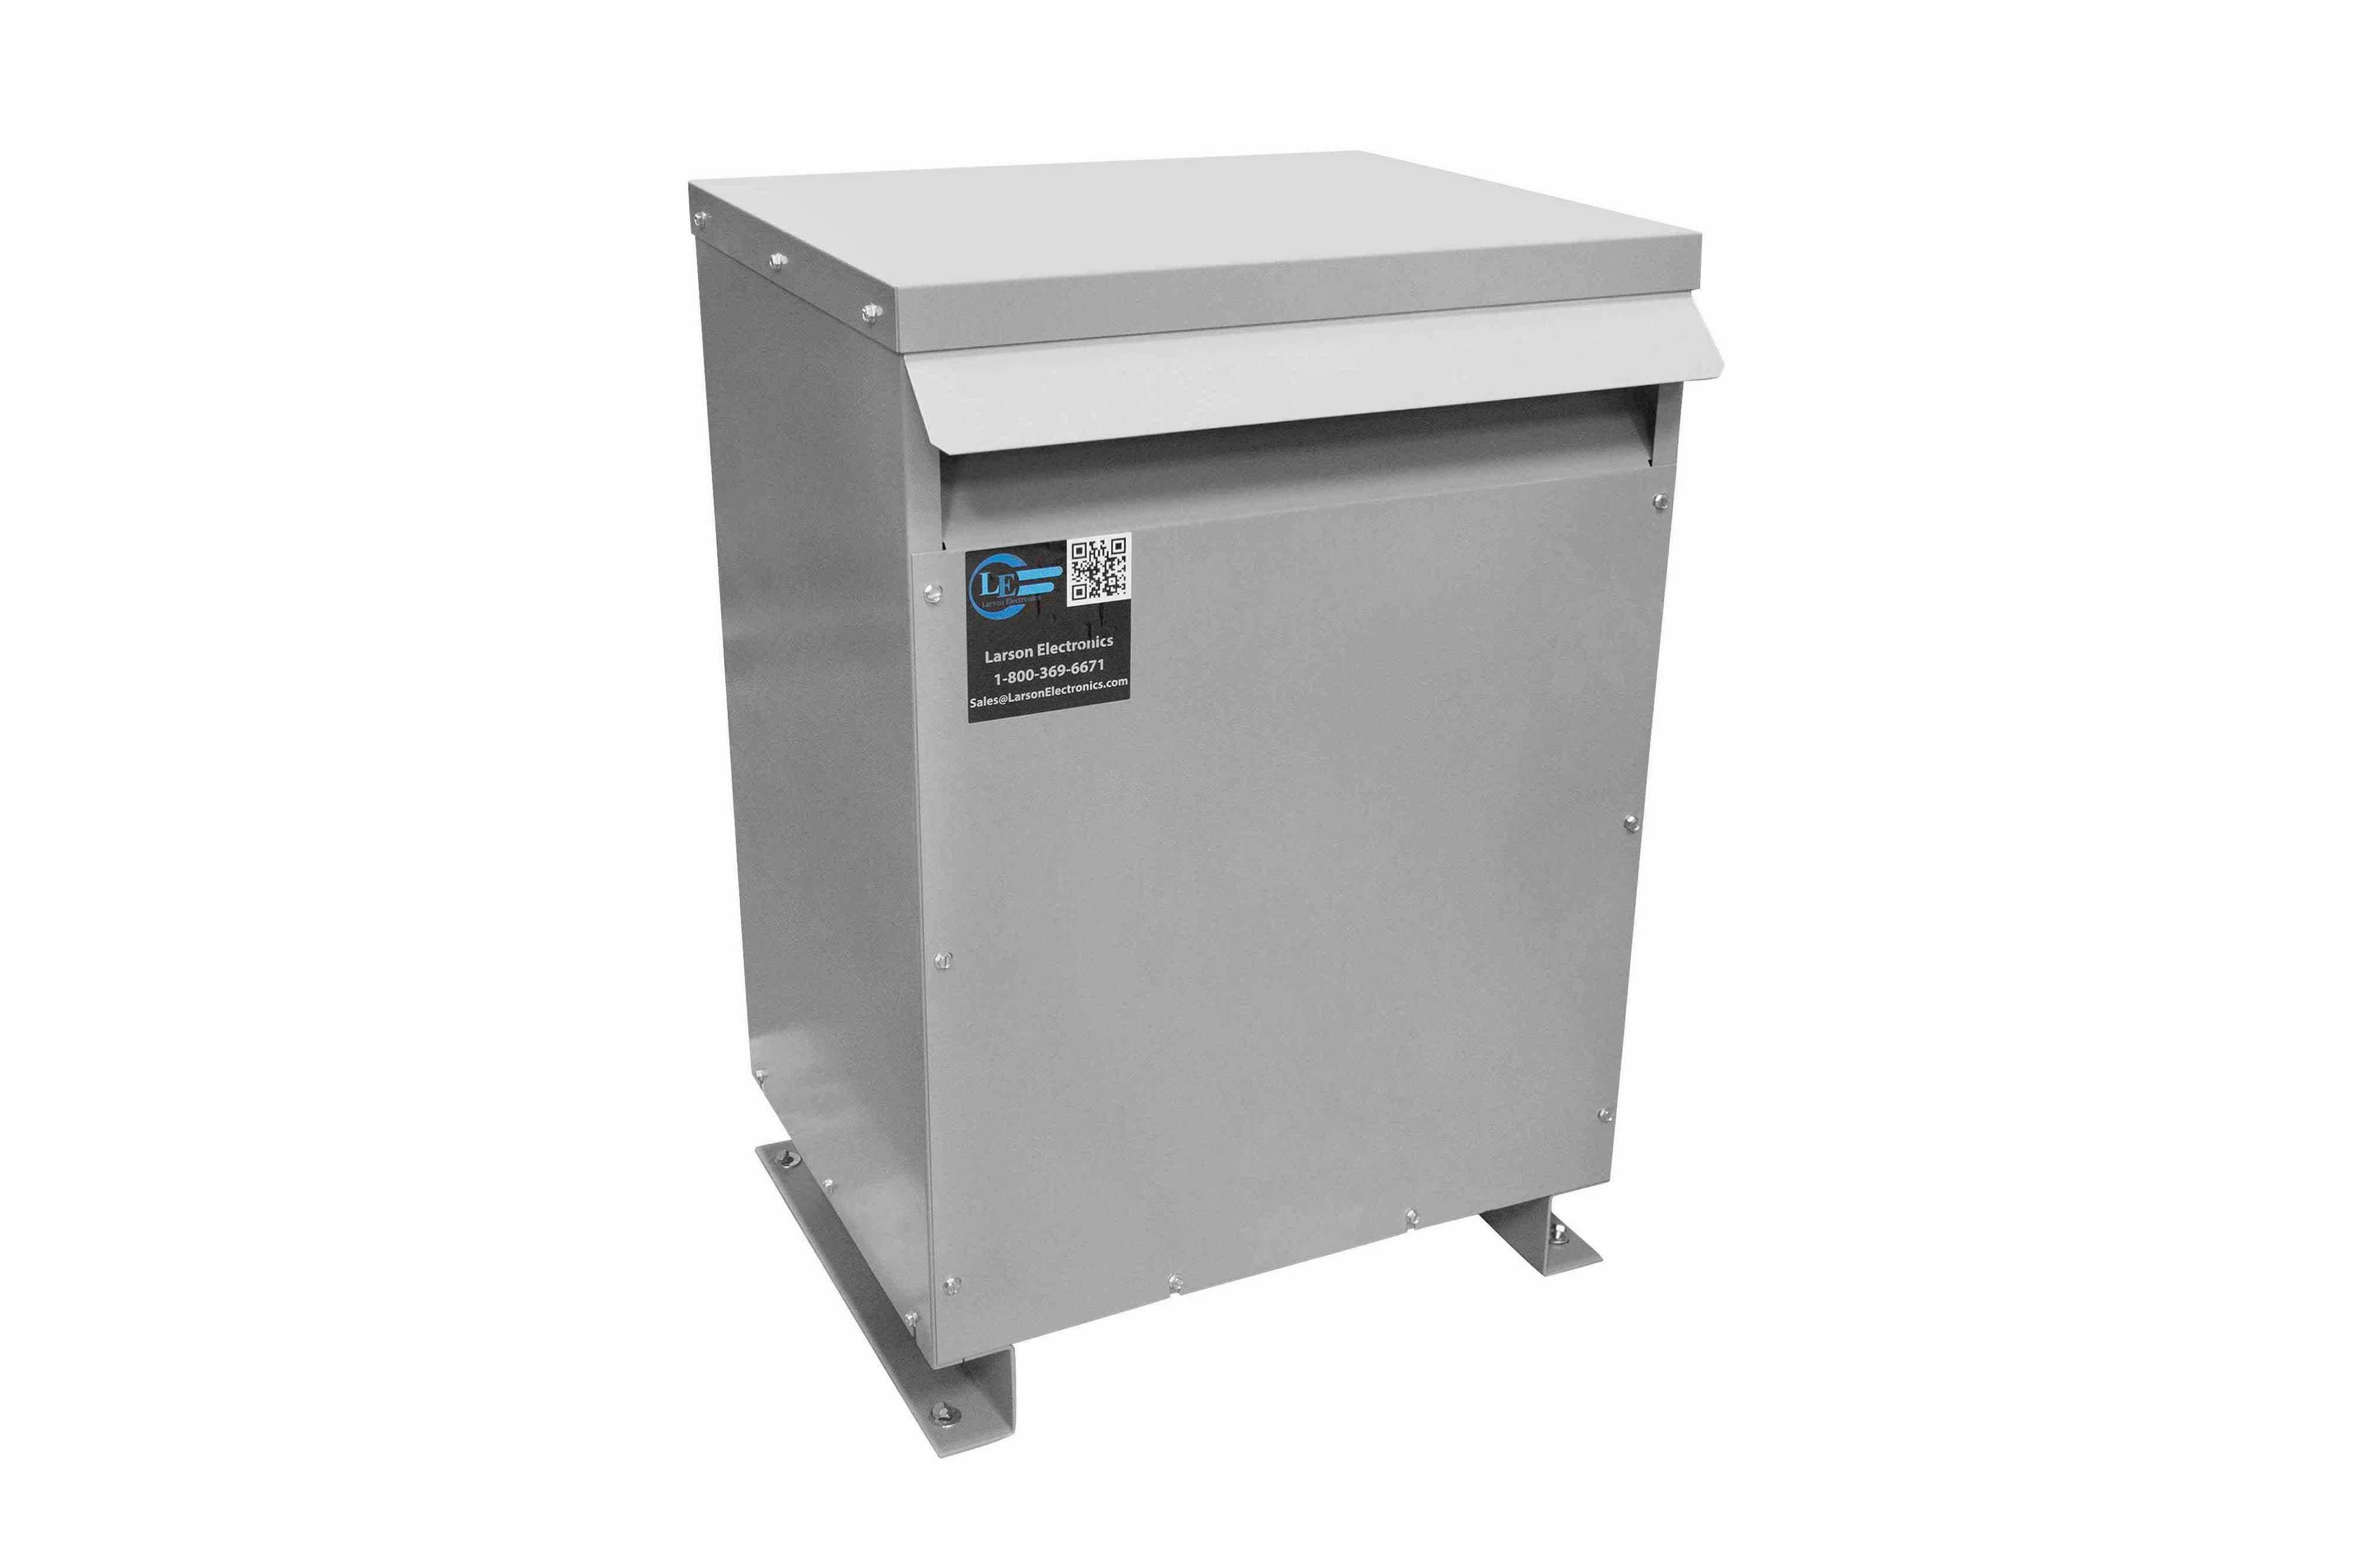 700 kVA 3PH Isolation Transformer, 460V Wye Primary, 240V/120 Delta Secondary, N3R, Ventilated, 60 Hz